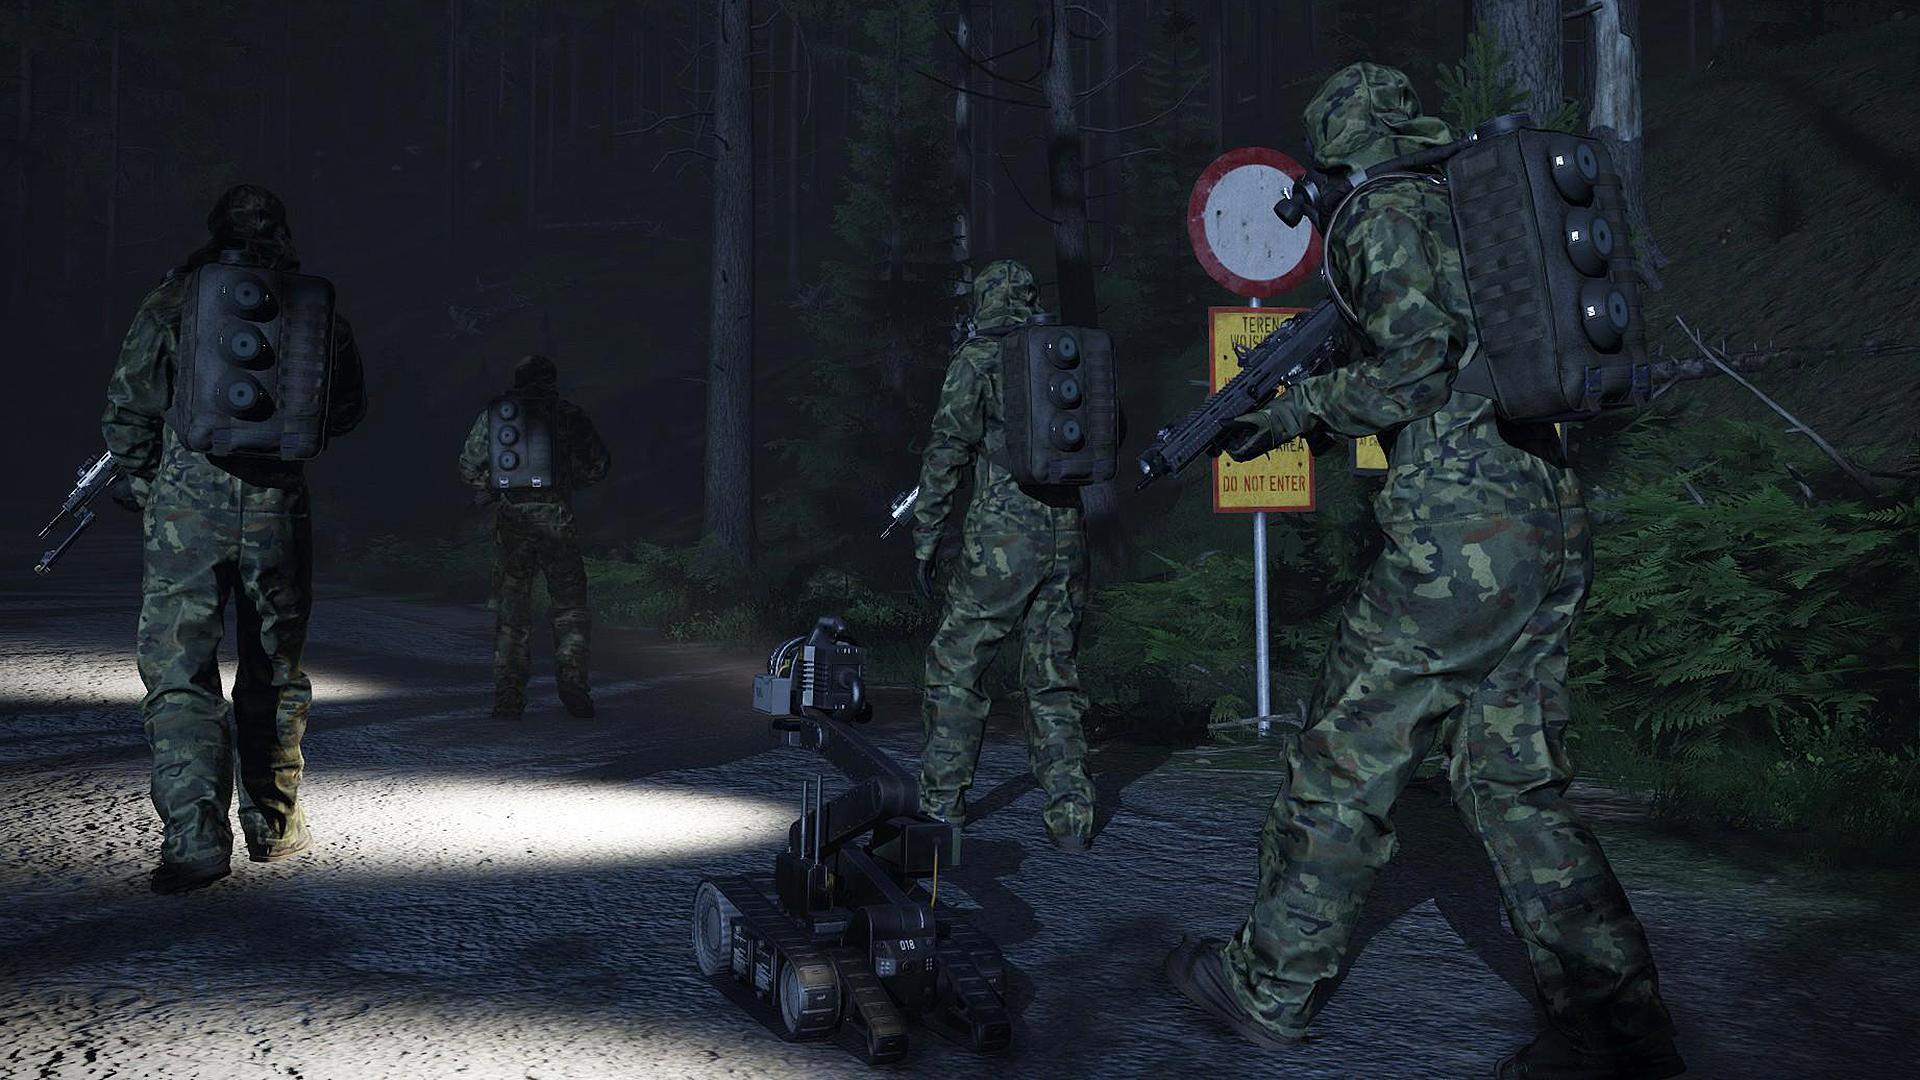 ARMA 3 CONTACT SANDBOX TRAILER | News | Arma 3